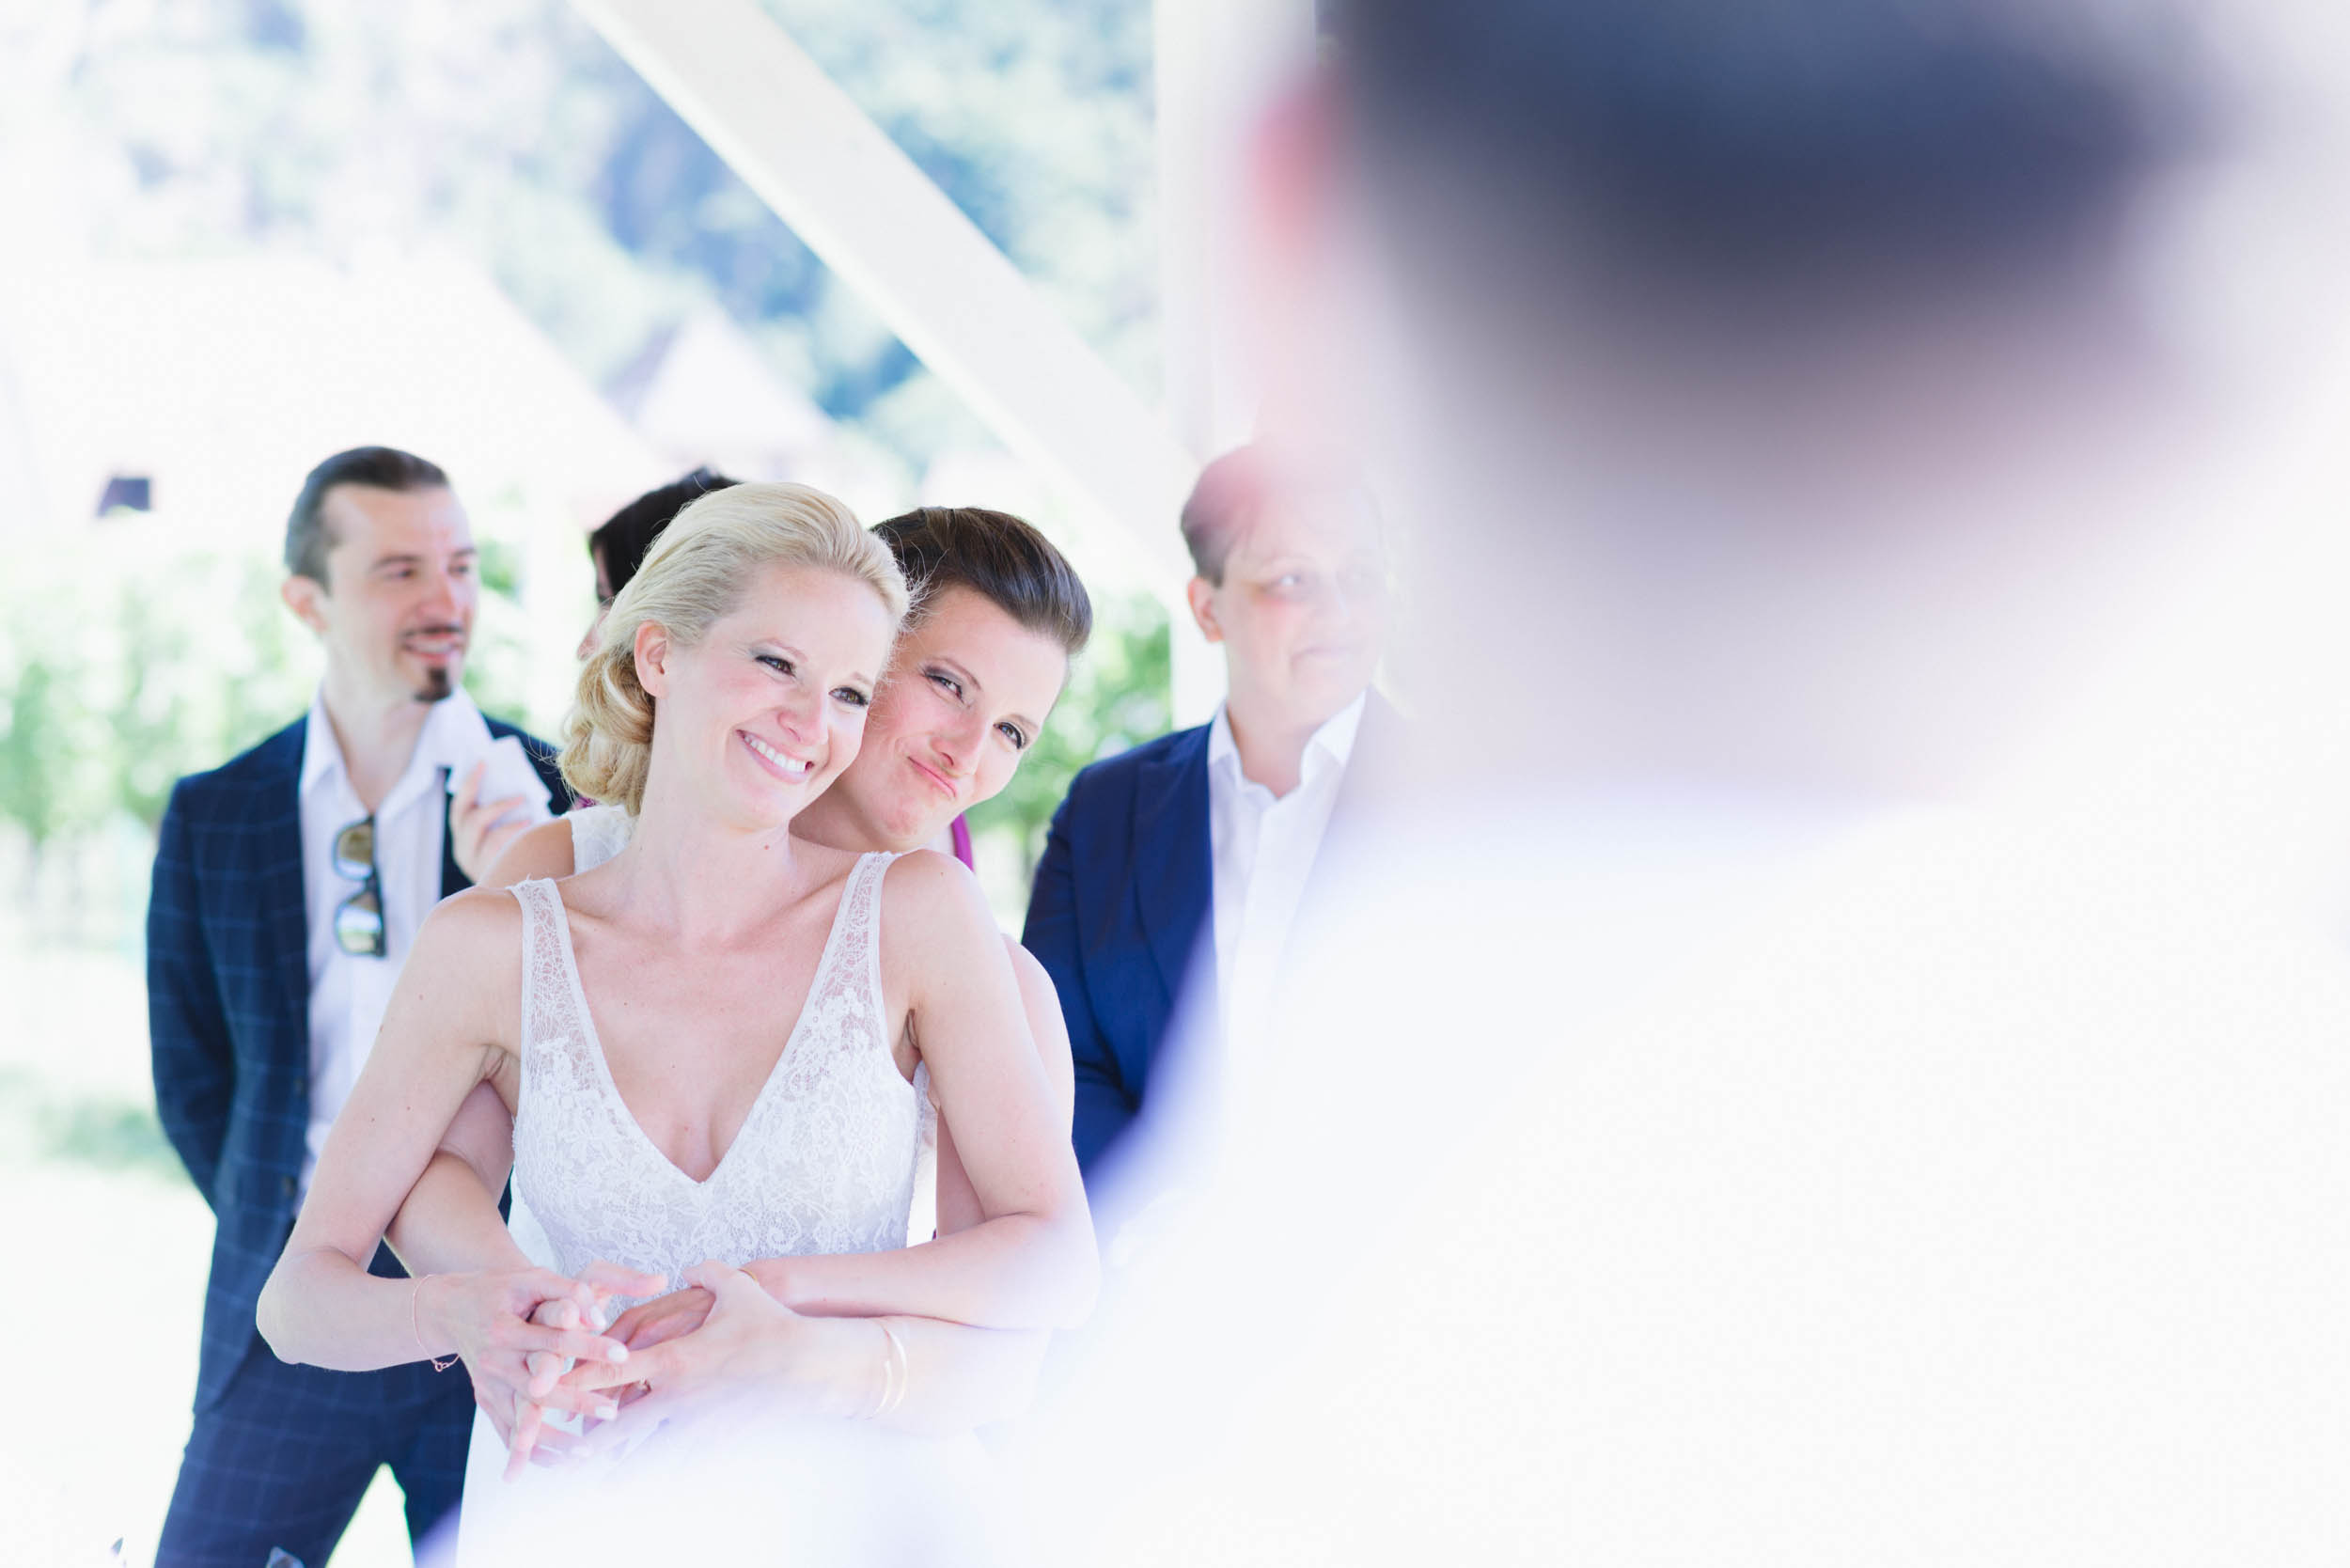 belle&sass__Lesbian Wedding in Austria_0058.jpg